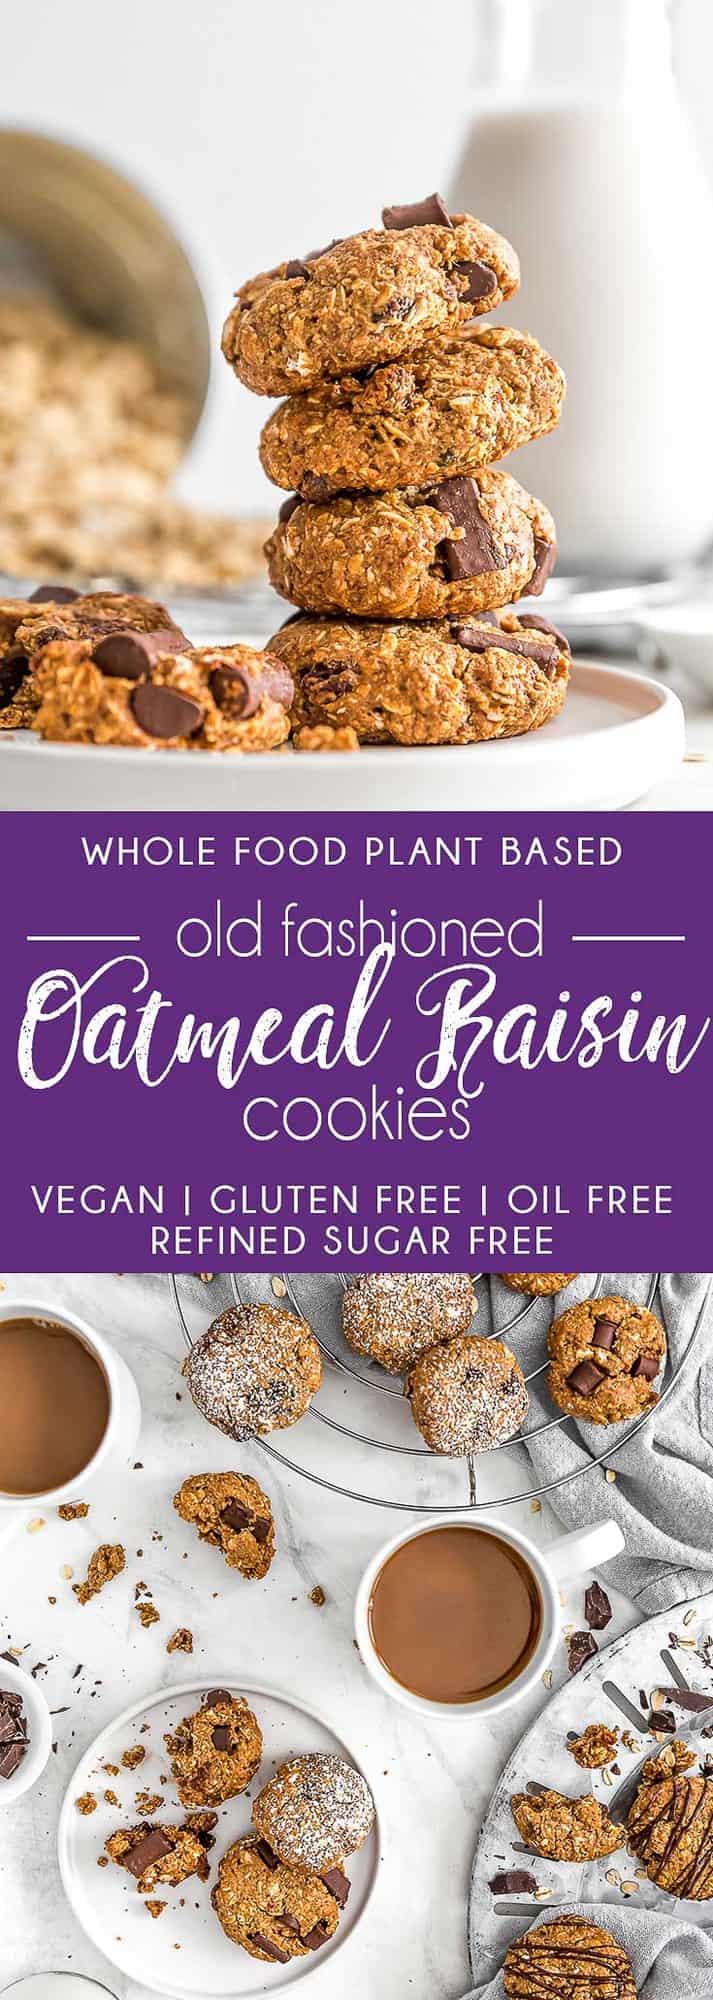 Old Fashioned Oatmeal Raisin Cookies, vegan cookie, vegan oatmeal cookies, vegan dessert, plant based, vegan, vegetarian, whole food plant based, gluten free, recipe, wfpb, healthy, healthy vegan, oil free, no refined sugar, no oil, refined sugar free, dairy free, chocolate, chocolate chips, oatmeal cookie, old fashioned cookie, easy cookie, treats, sweets, desserts